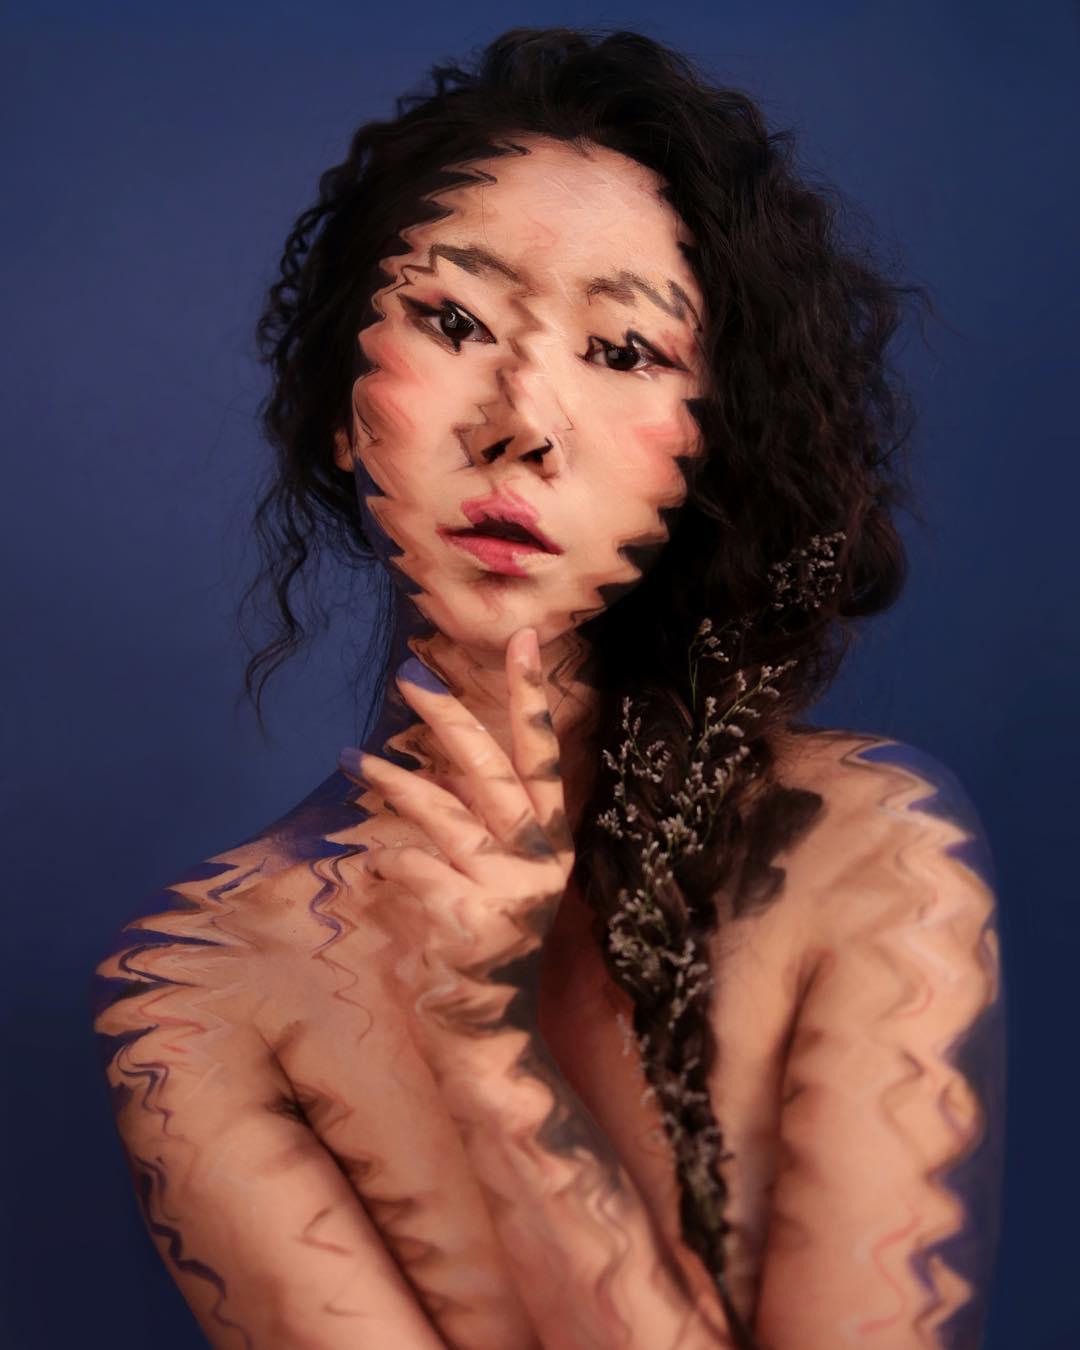 dain-yoon-art-17-1557519433204.jpg